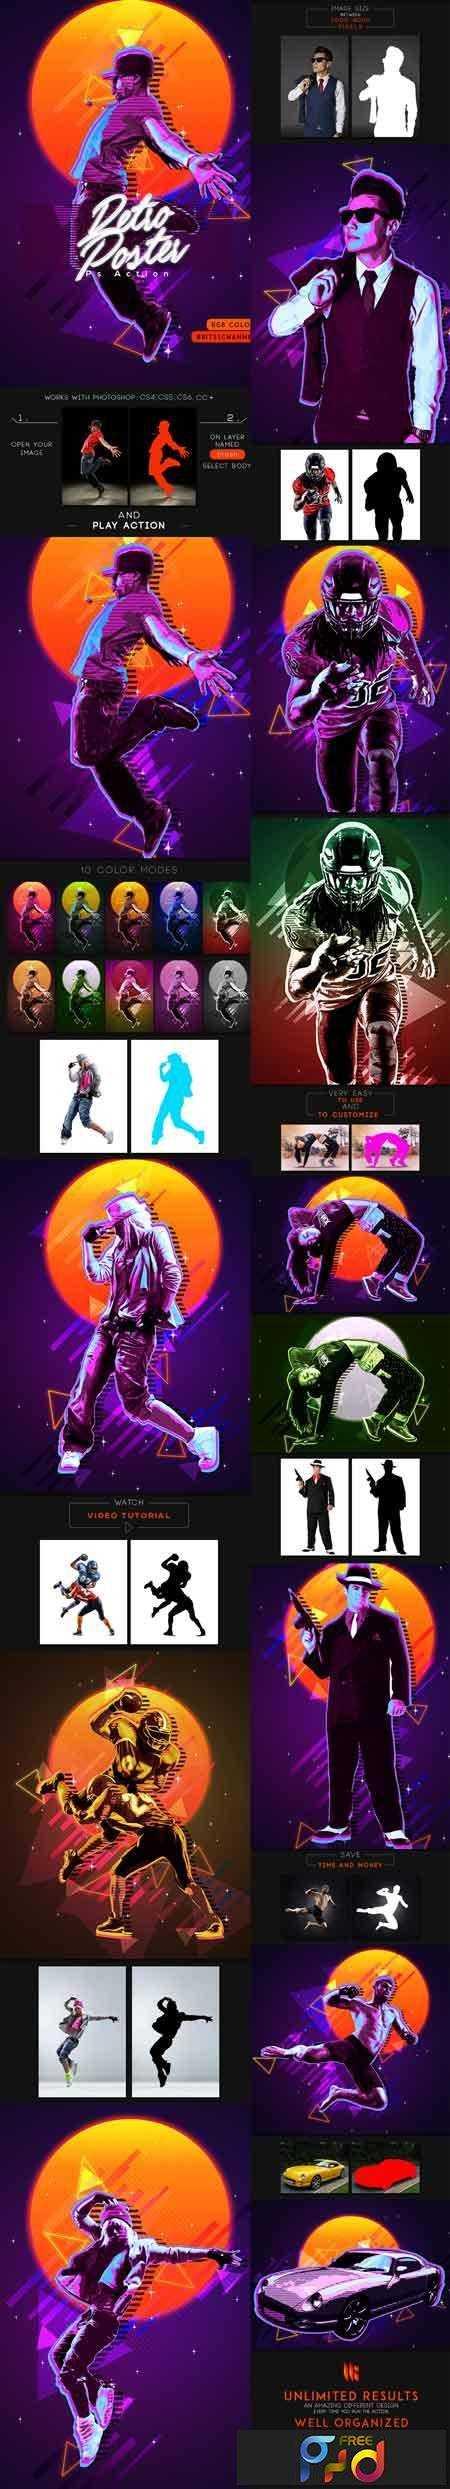 1803126 80s Retro Poster Photoshop Action 21362682 Freepsdvn